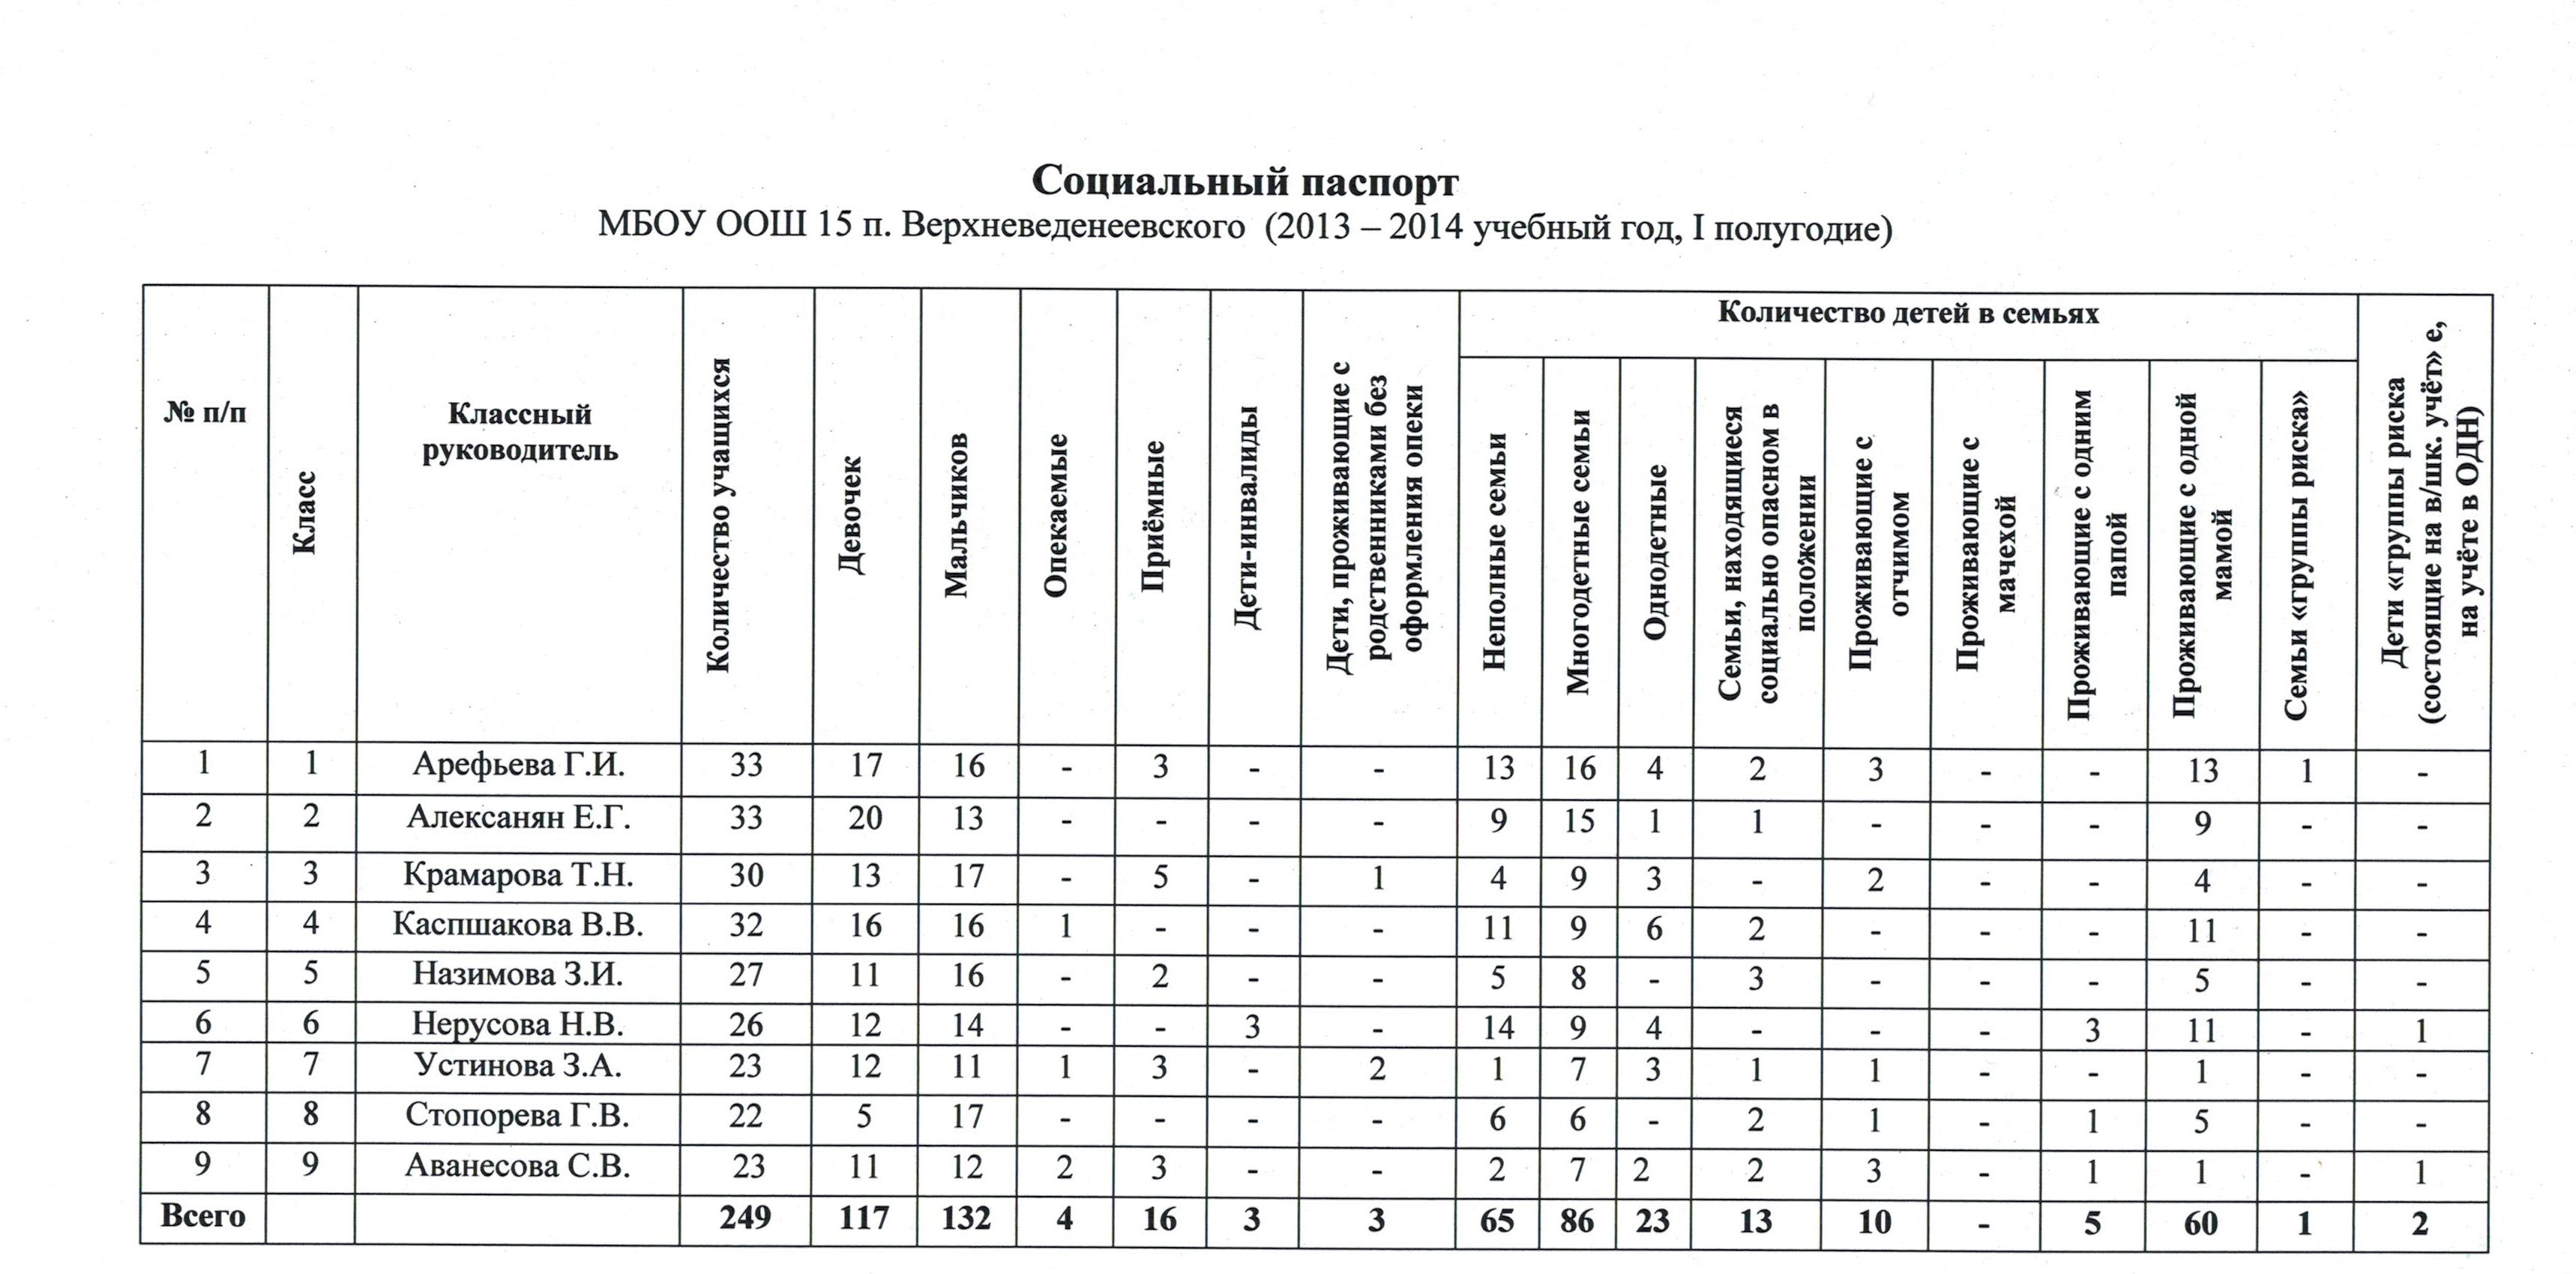 http://belschool15.kuban.ru/doc/1_1.jpg